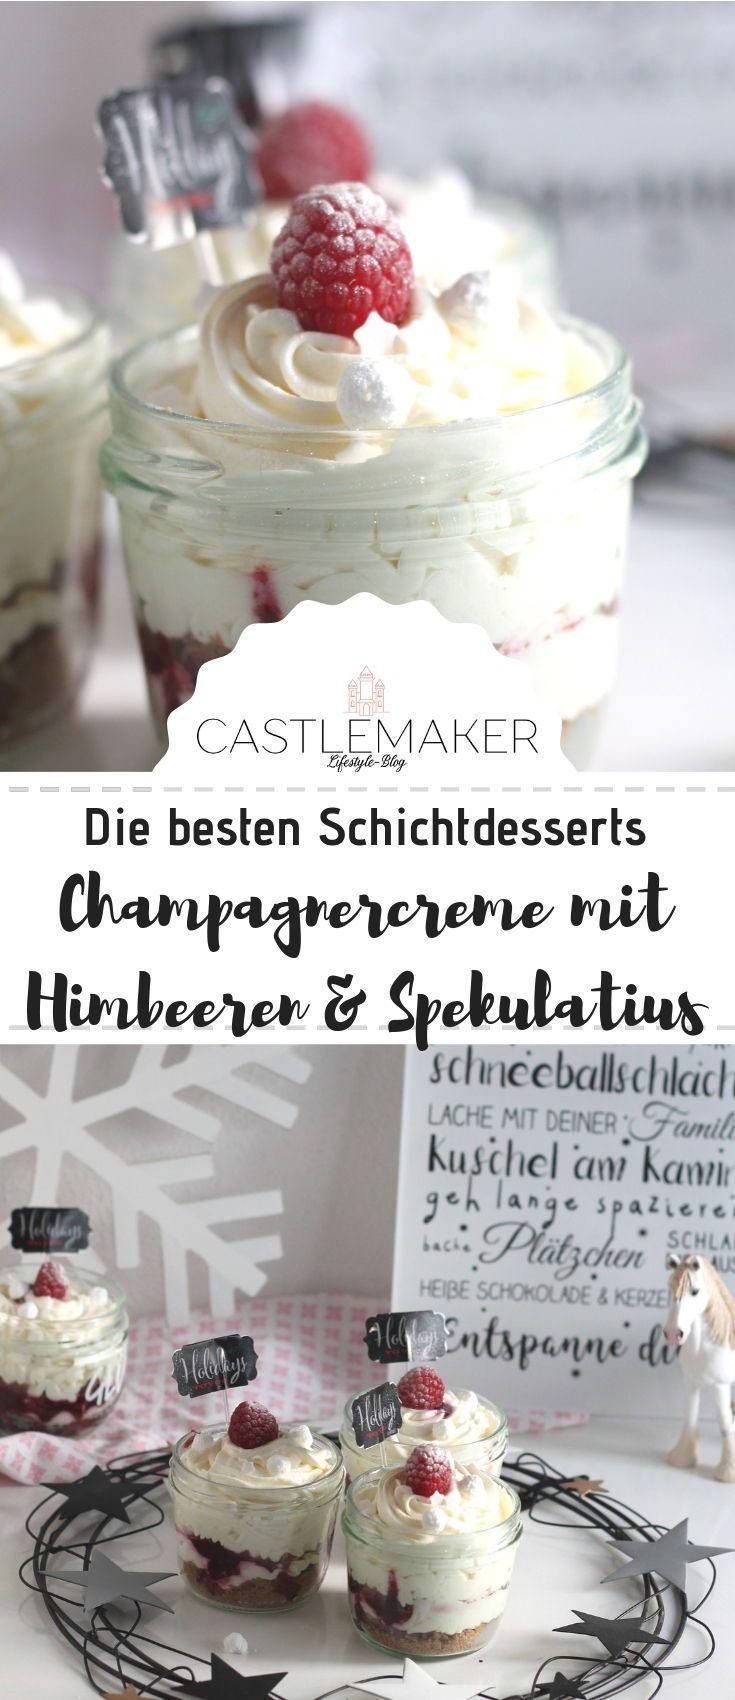 Champagnercreme Schichtdessert im Glas // Dessert Rezept #cupcakesrezepte